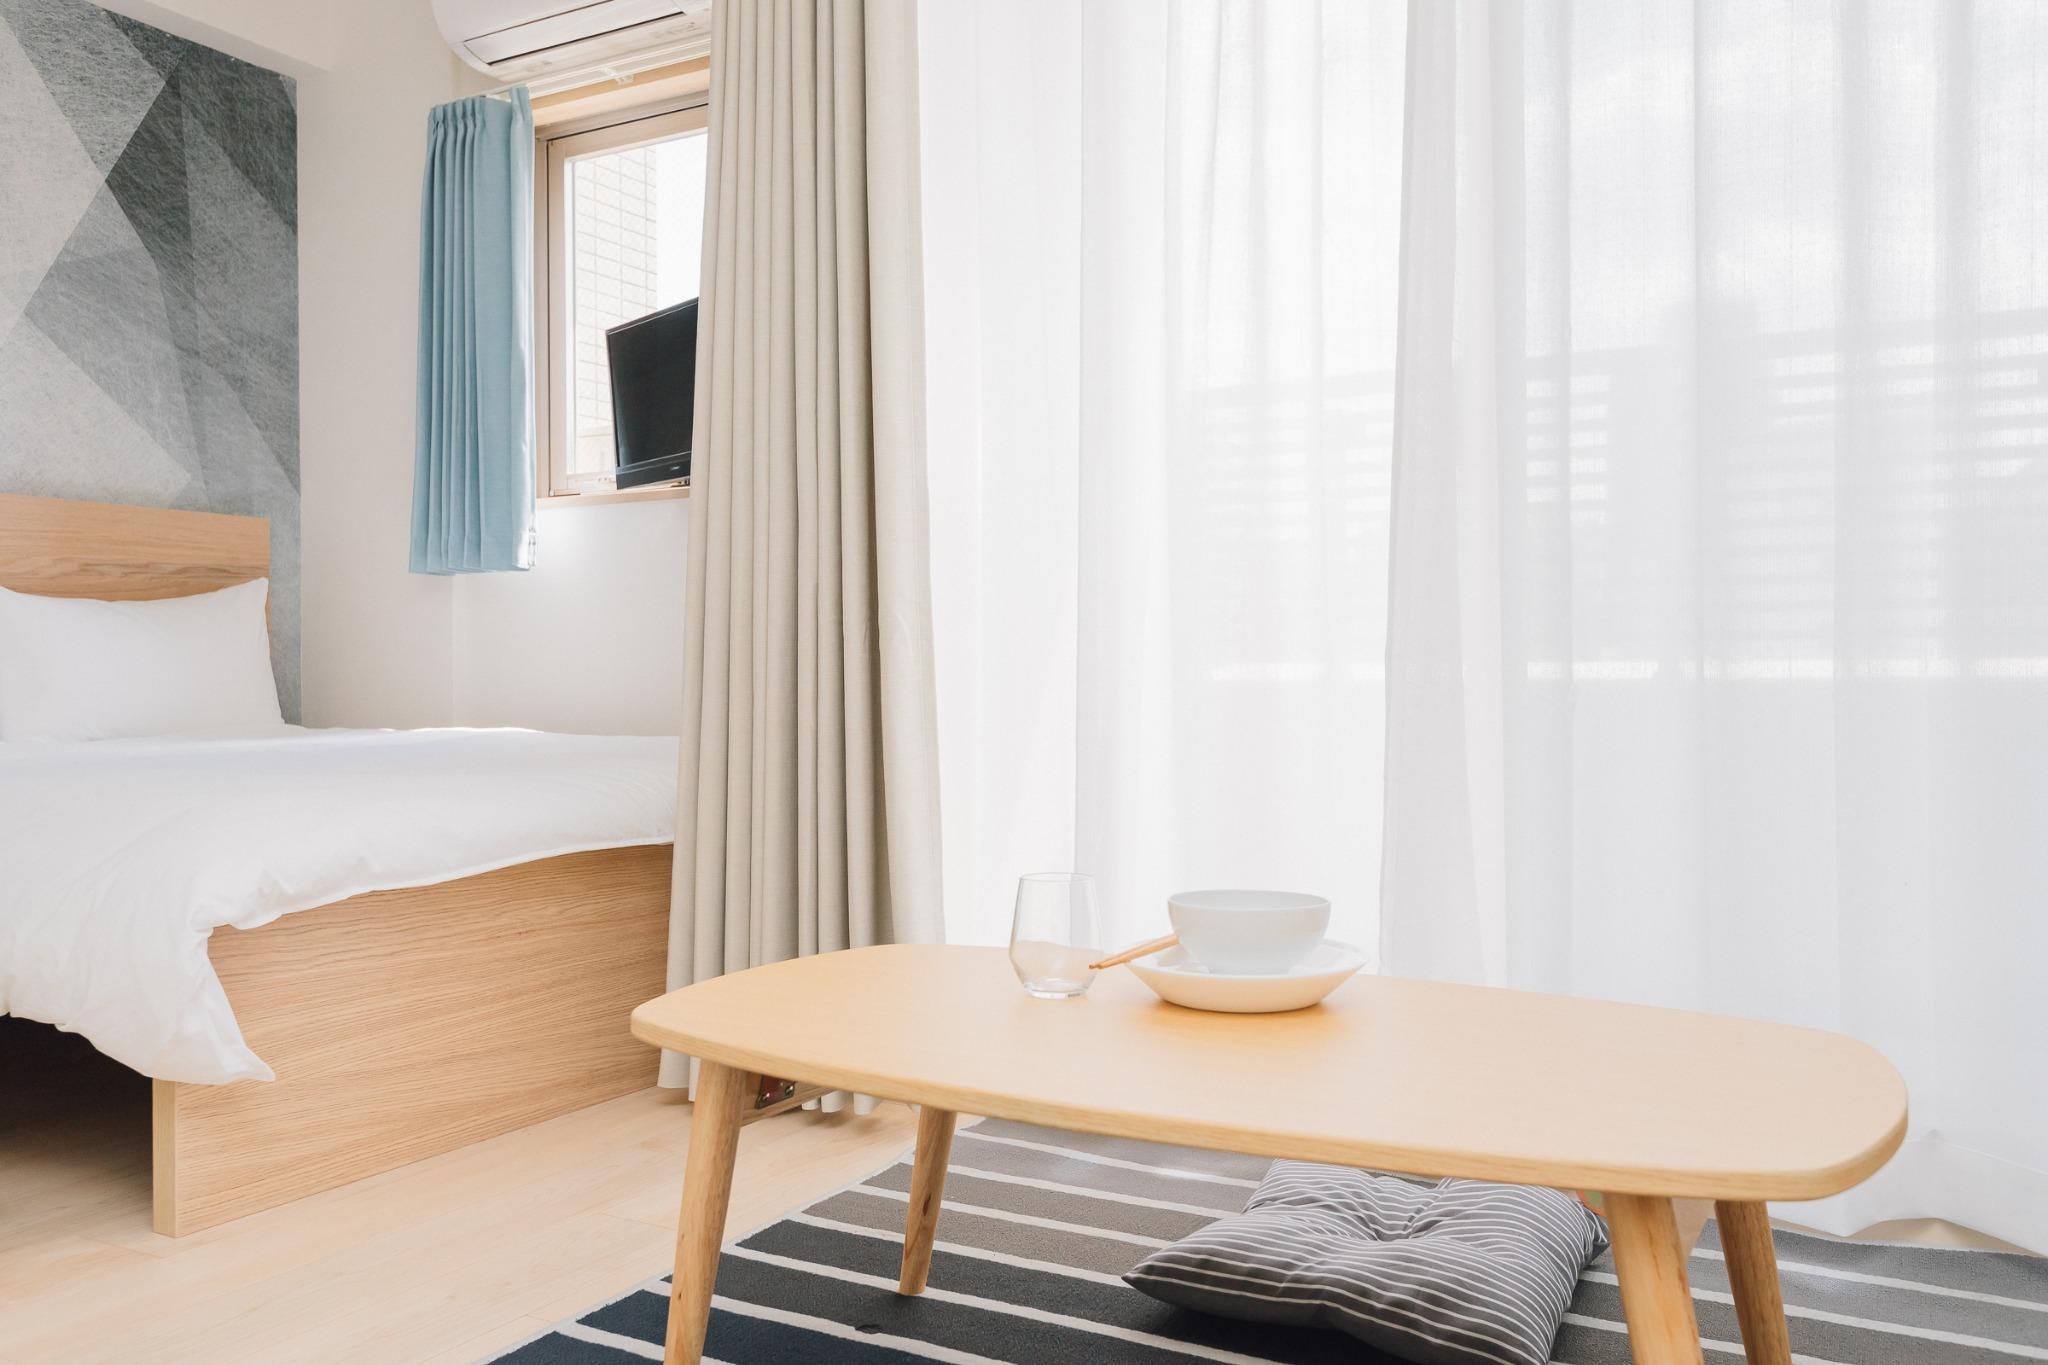 梅田1駅/十三駅歩5分 AFP Luxury Apartment Room 4